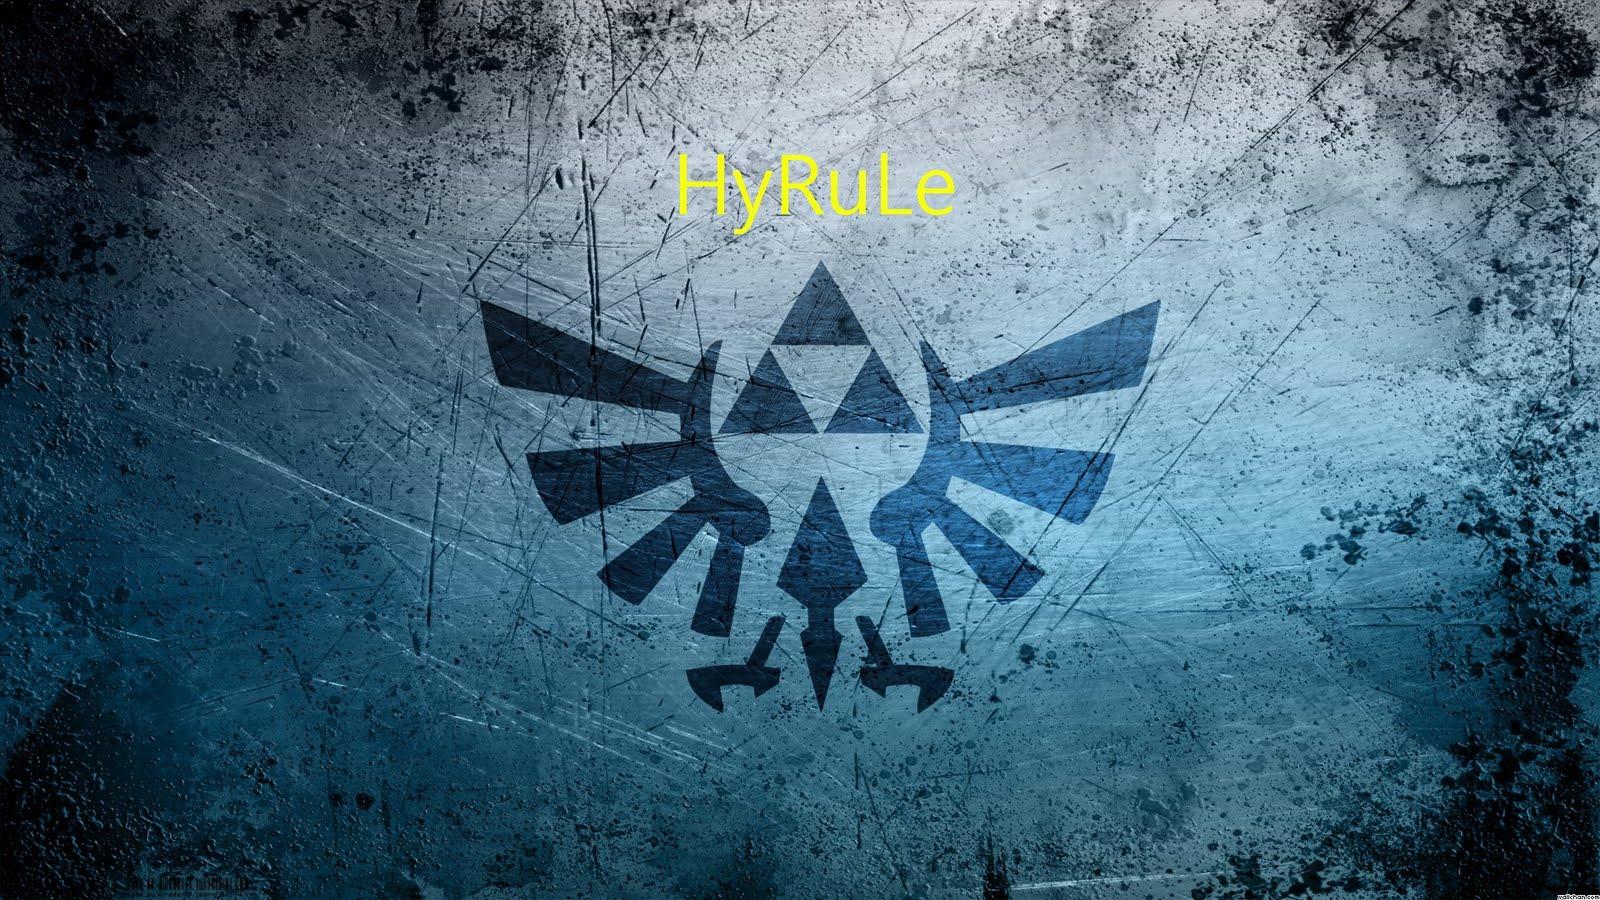 https://2.bp.blogspot.com/-U4RXSiR5Z_Q/Tw4Pb5bySNI/AAAAAAAAALY/Hjl68S2KFc0/s1600/test-blog-blue-logo-games-zelda-metal-rpg-triforce-wallpaper-wallpaper.jpg